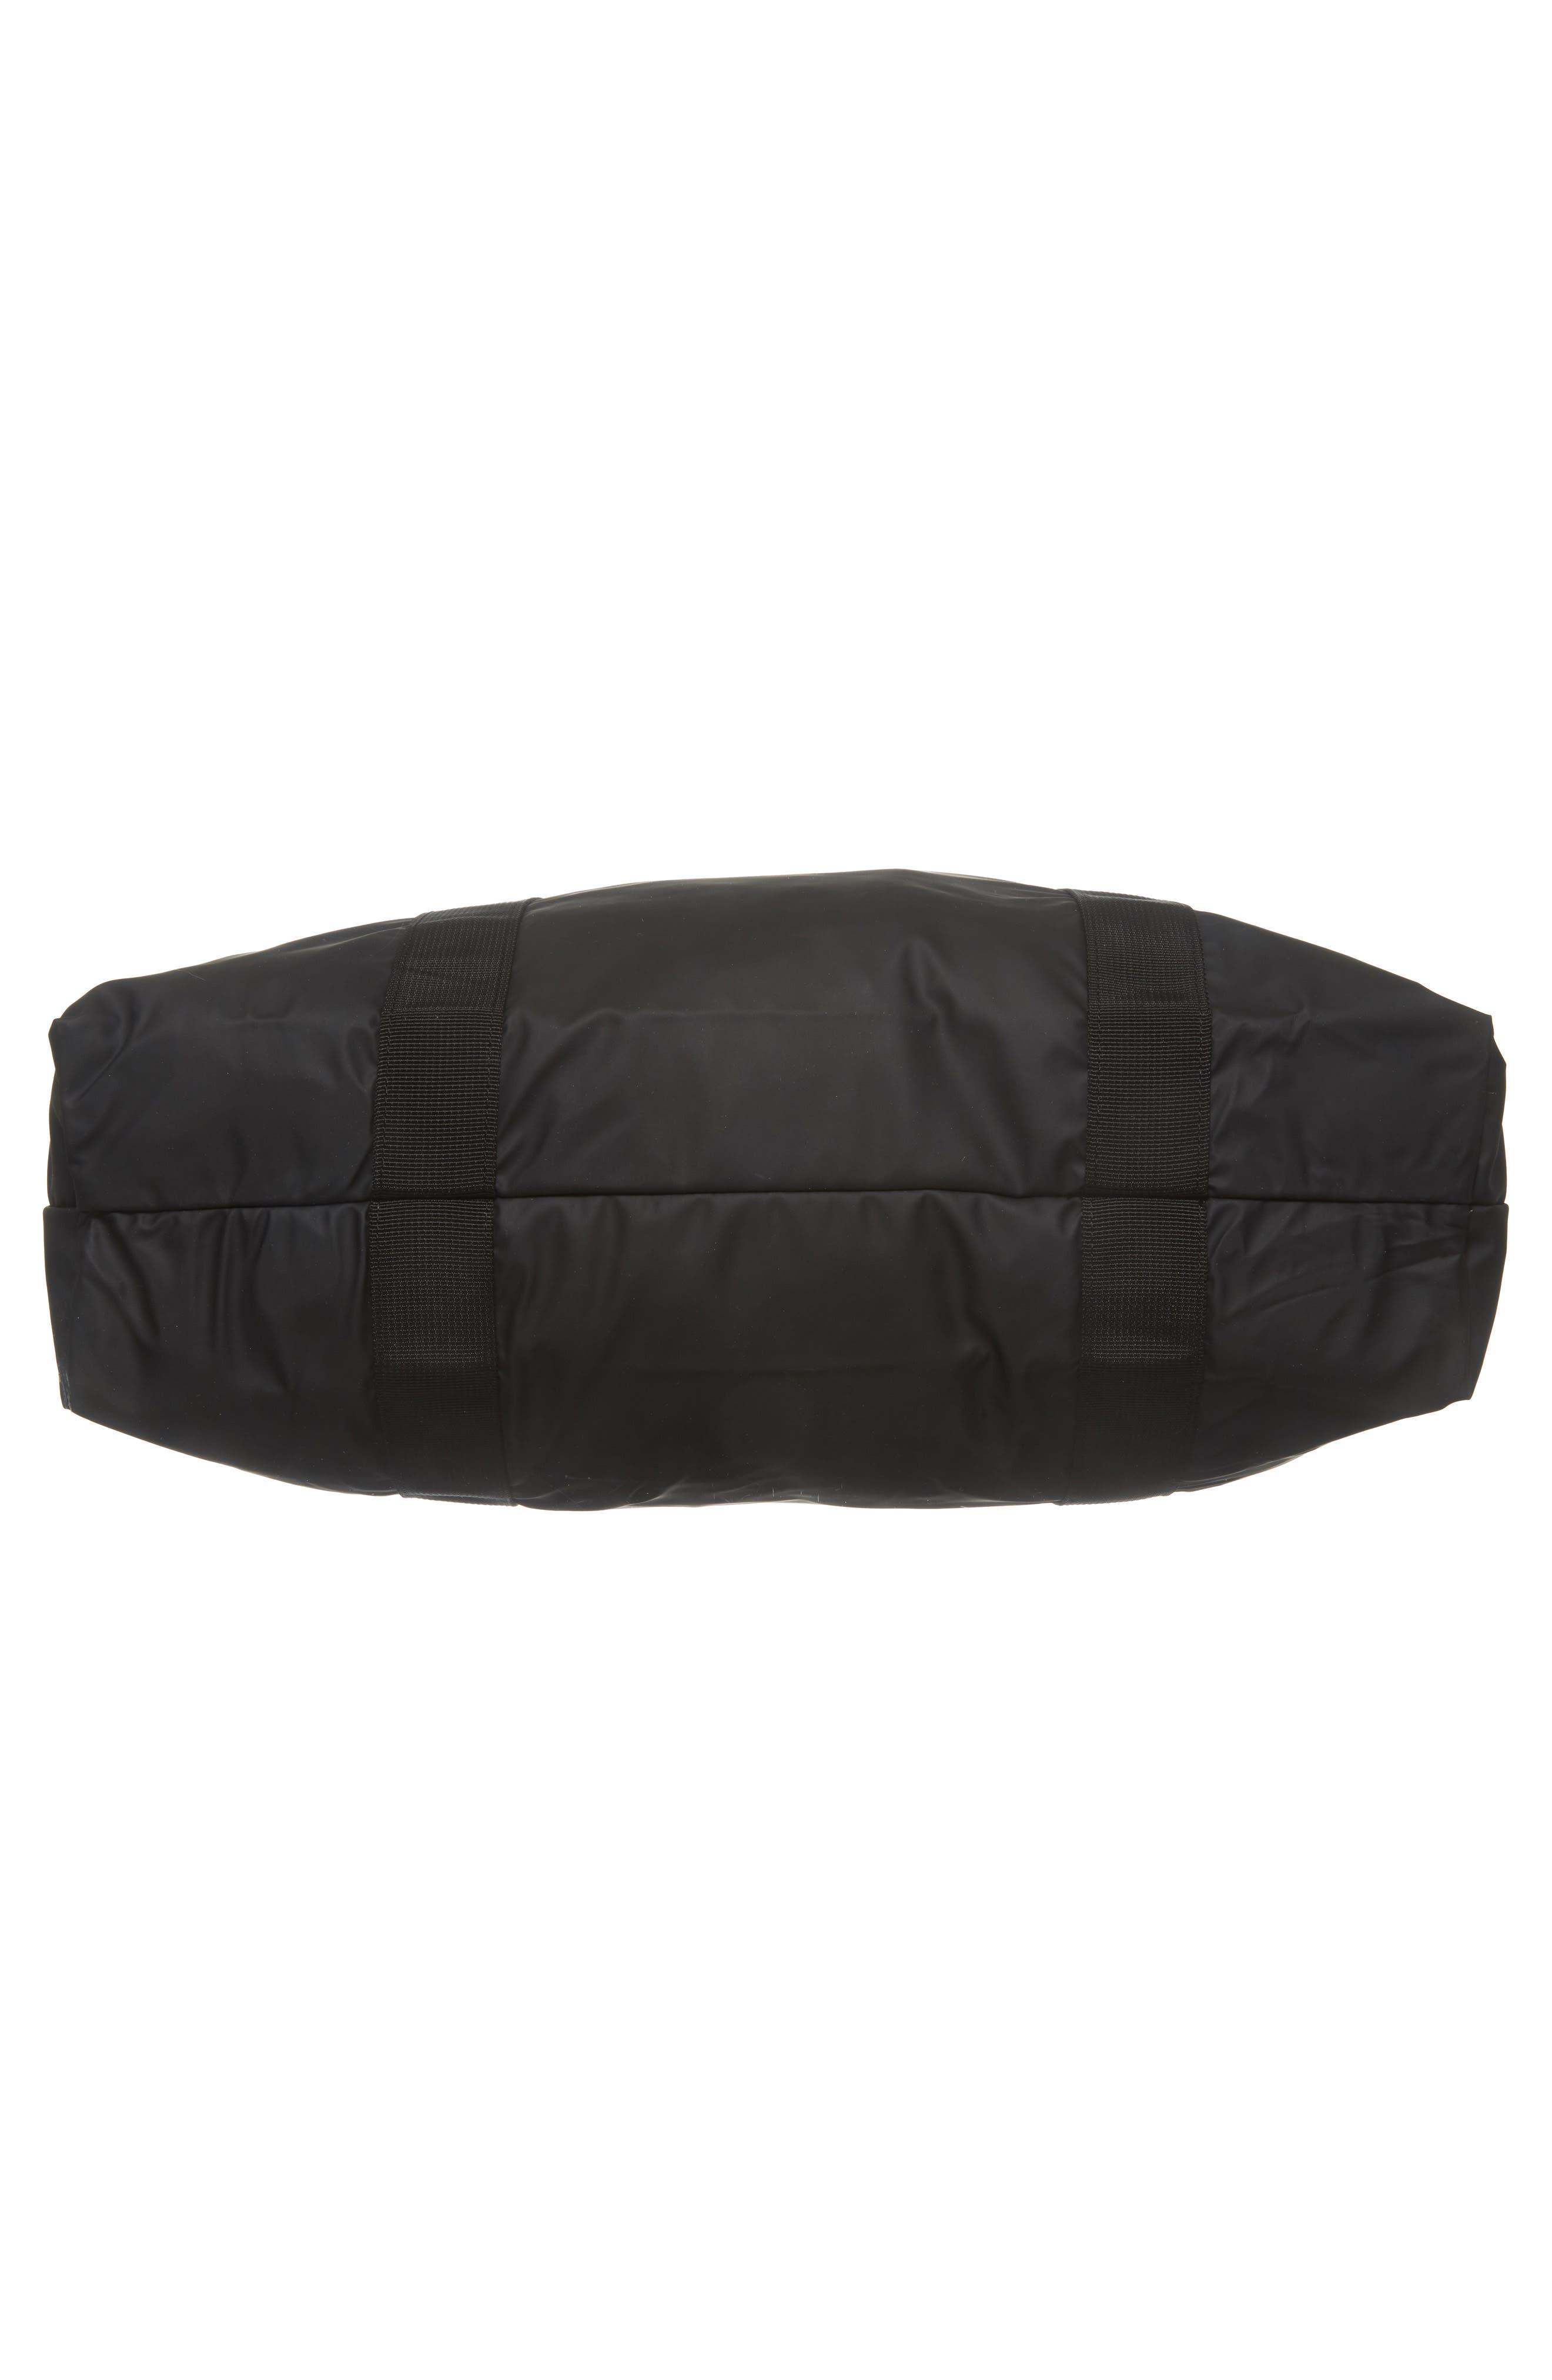 Waterproof Tote Bag,                             Alternate thumbnail 6, color,                             BLACK